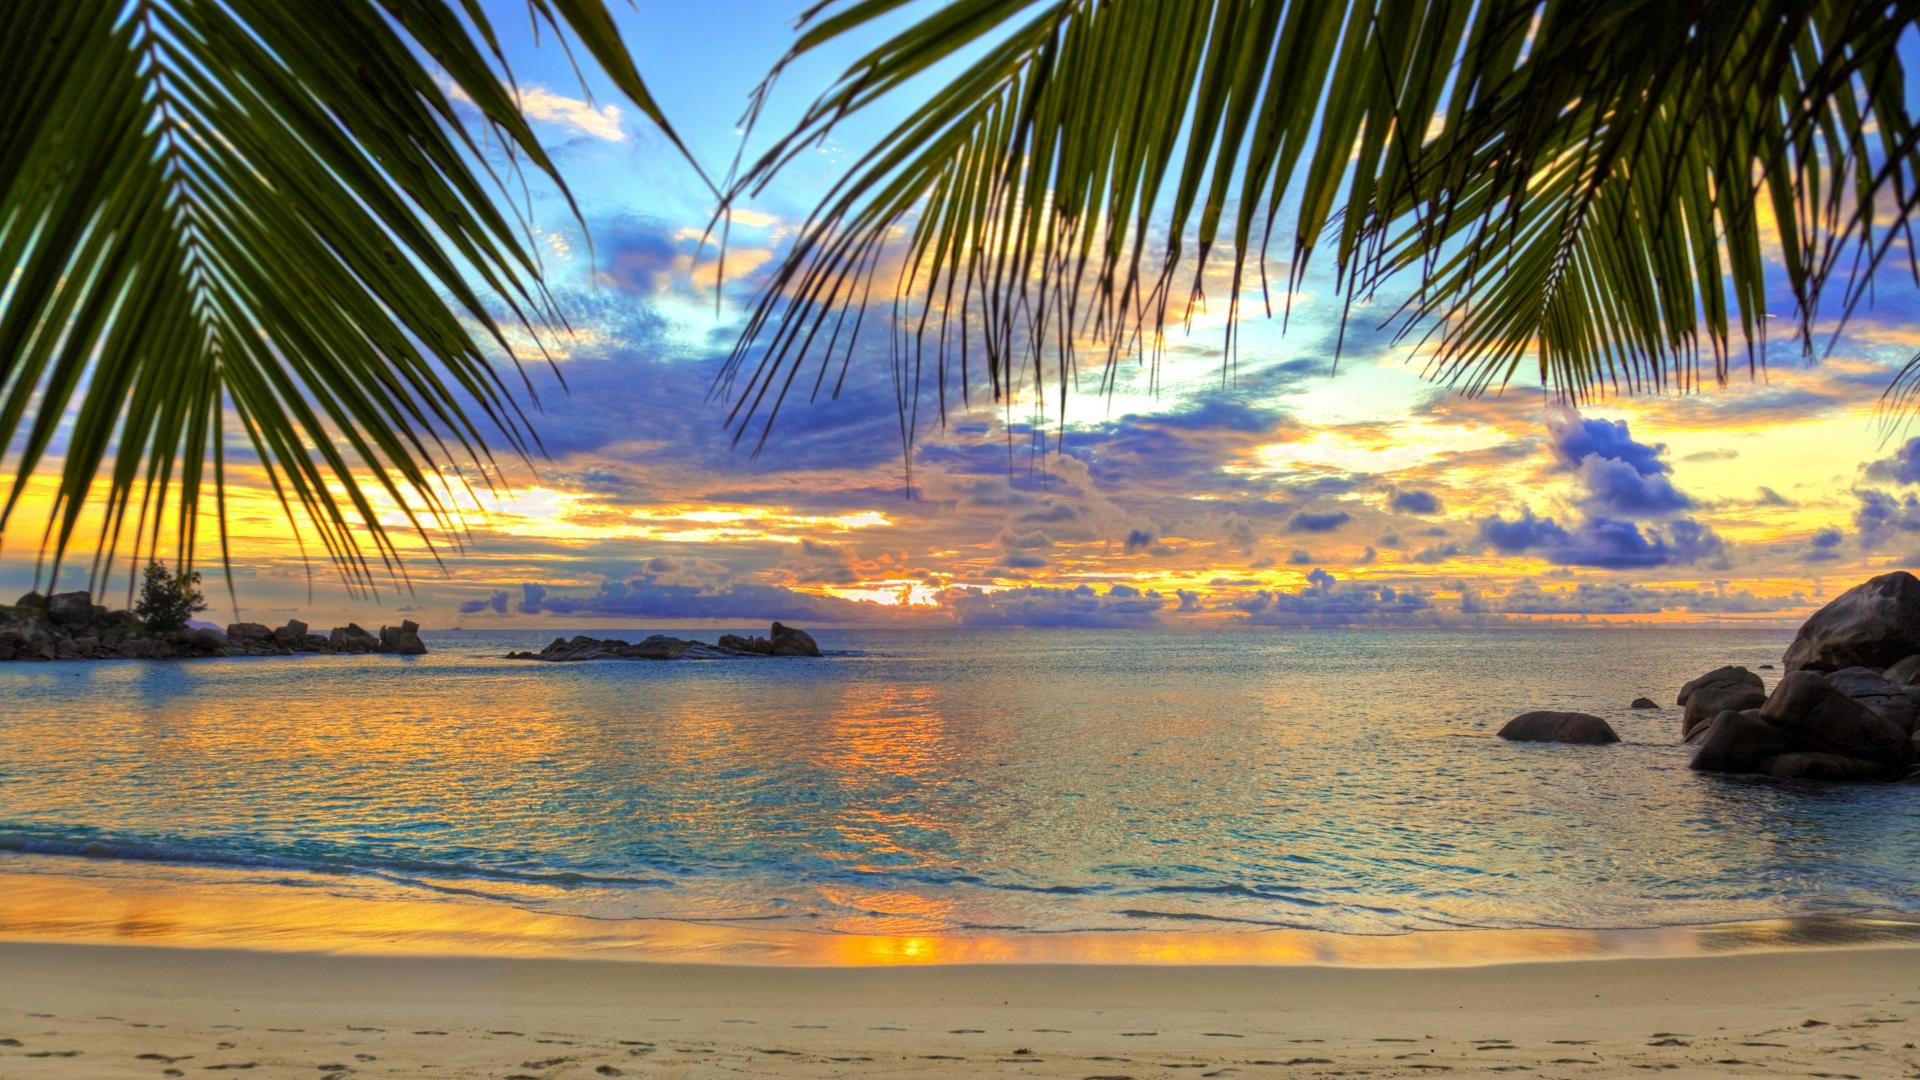 beach-tropics-sea-sand-palm-trees-1920x1080-1920%C3%971080-wallpaper-wpc5802602